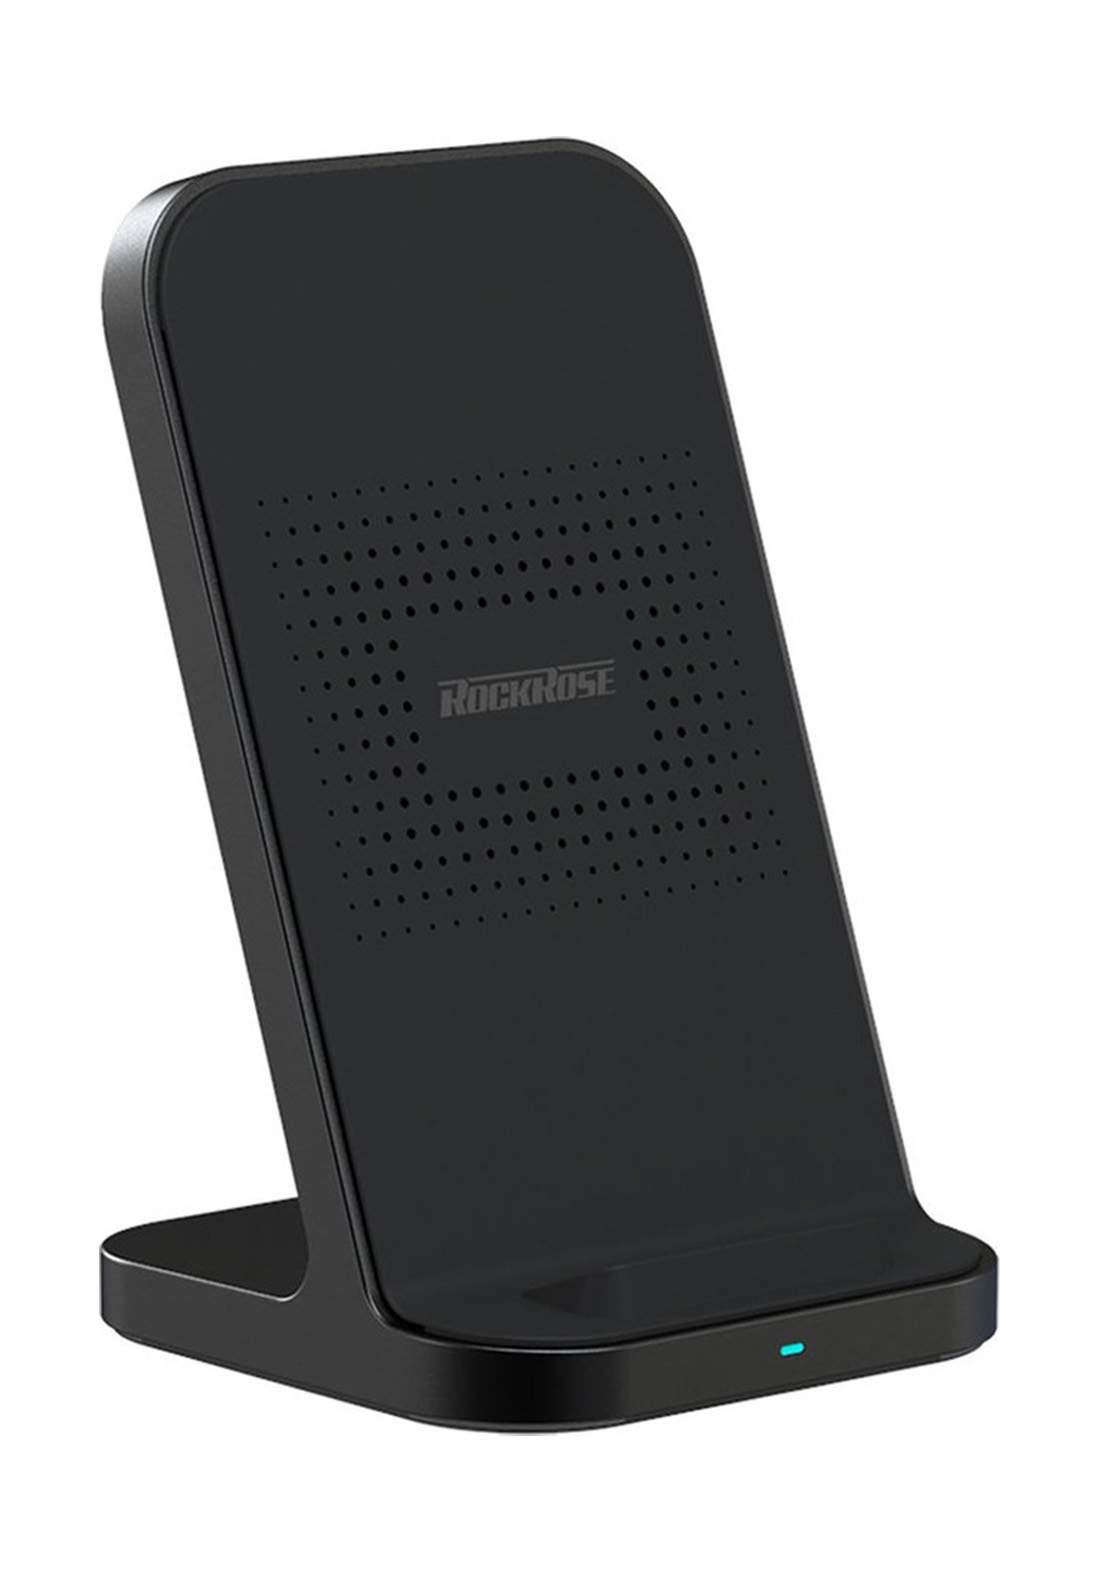 (4137)RockRose RRWC03 Wireless Charger 10W - Black شاحن لا سلكي